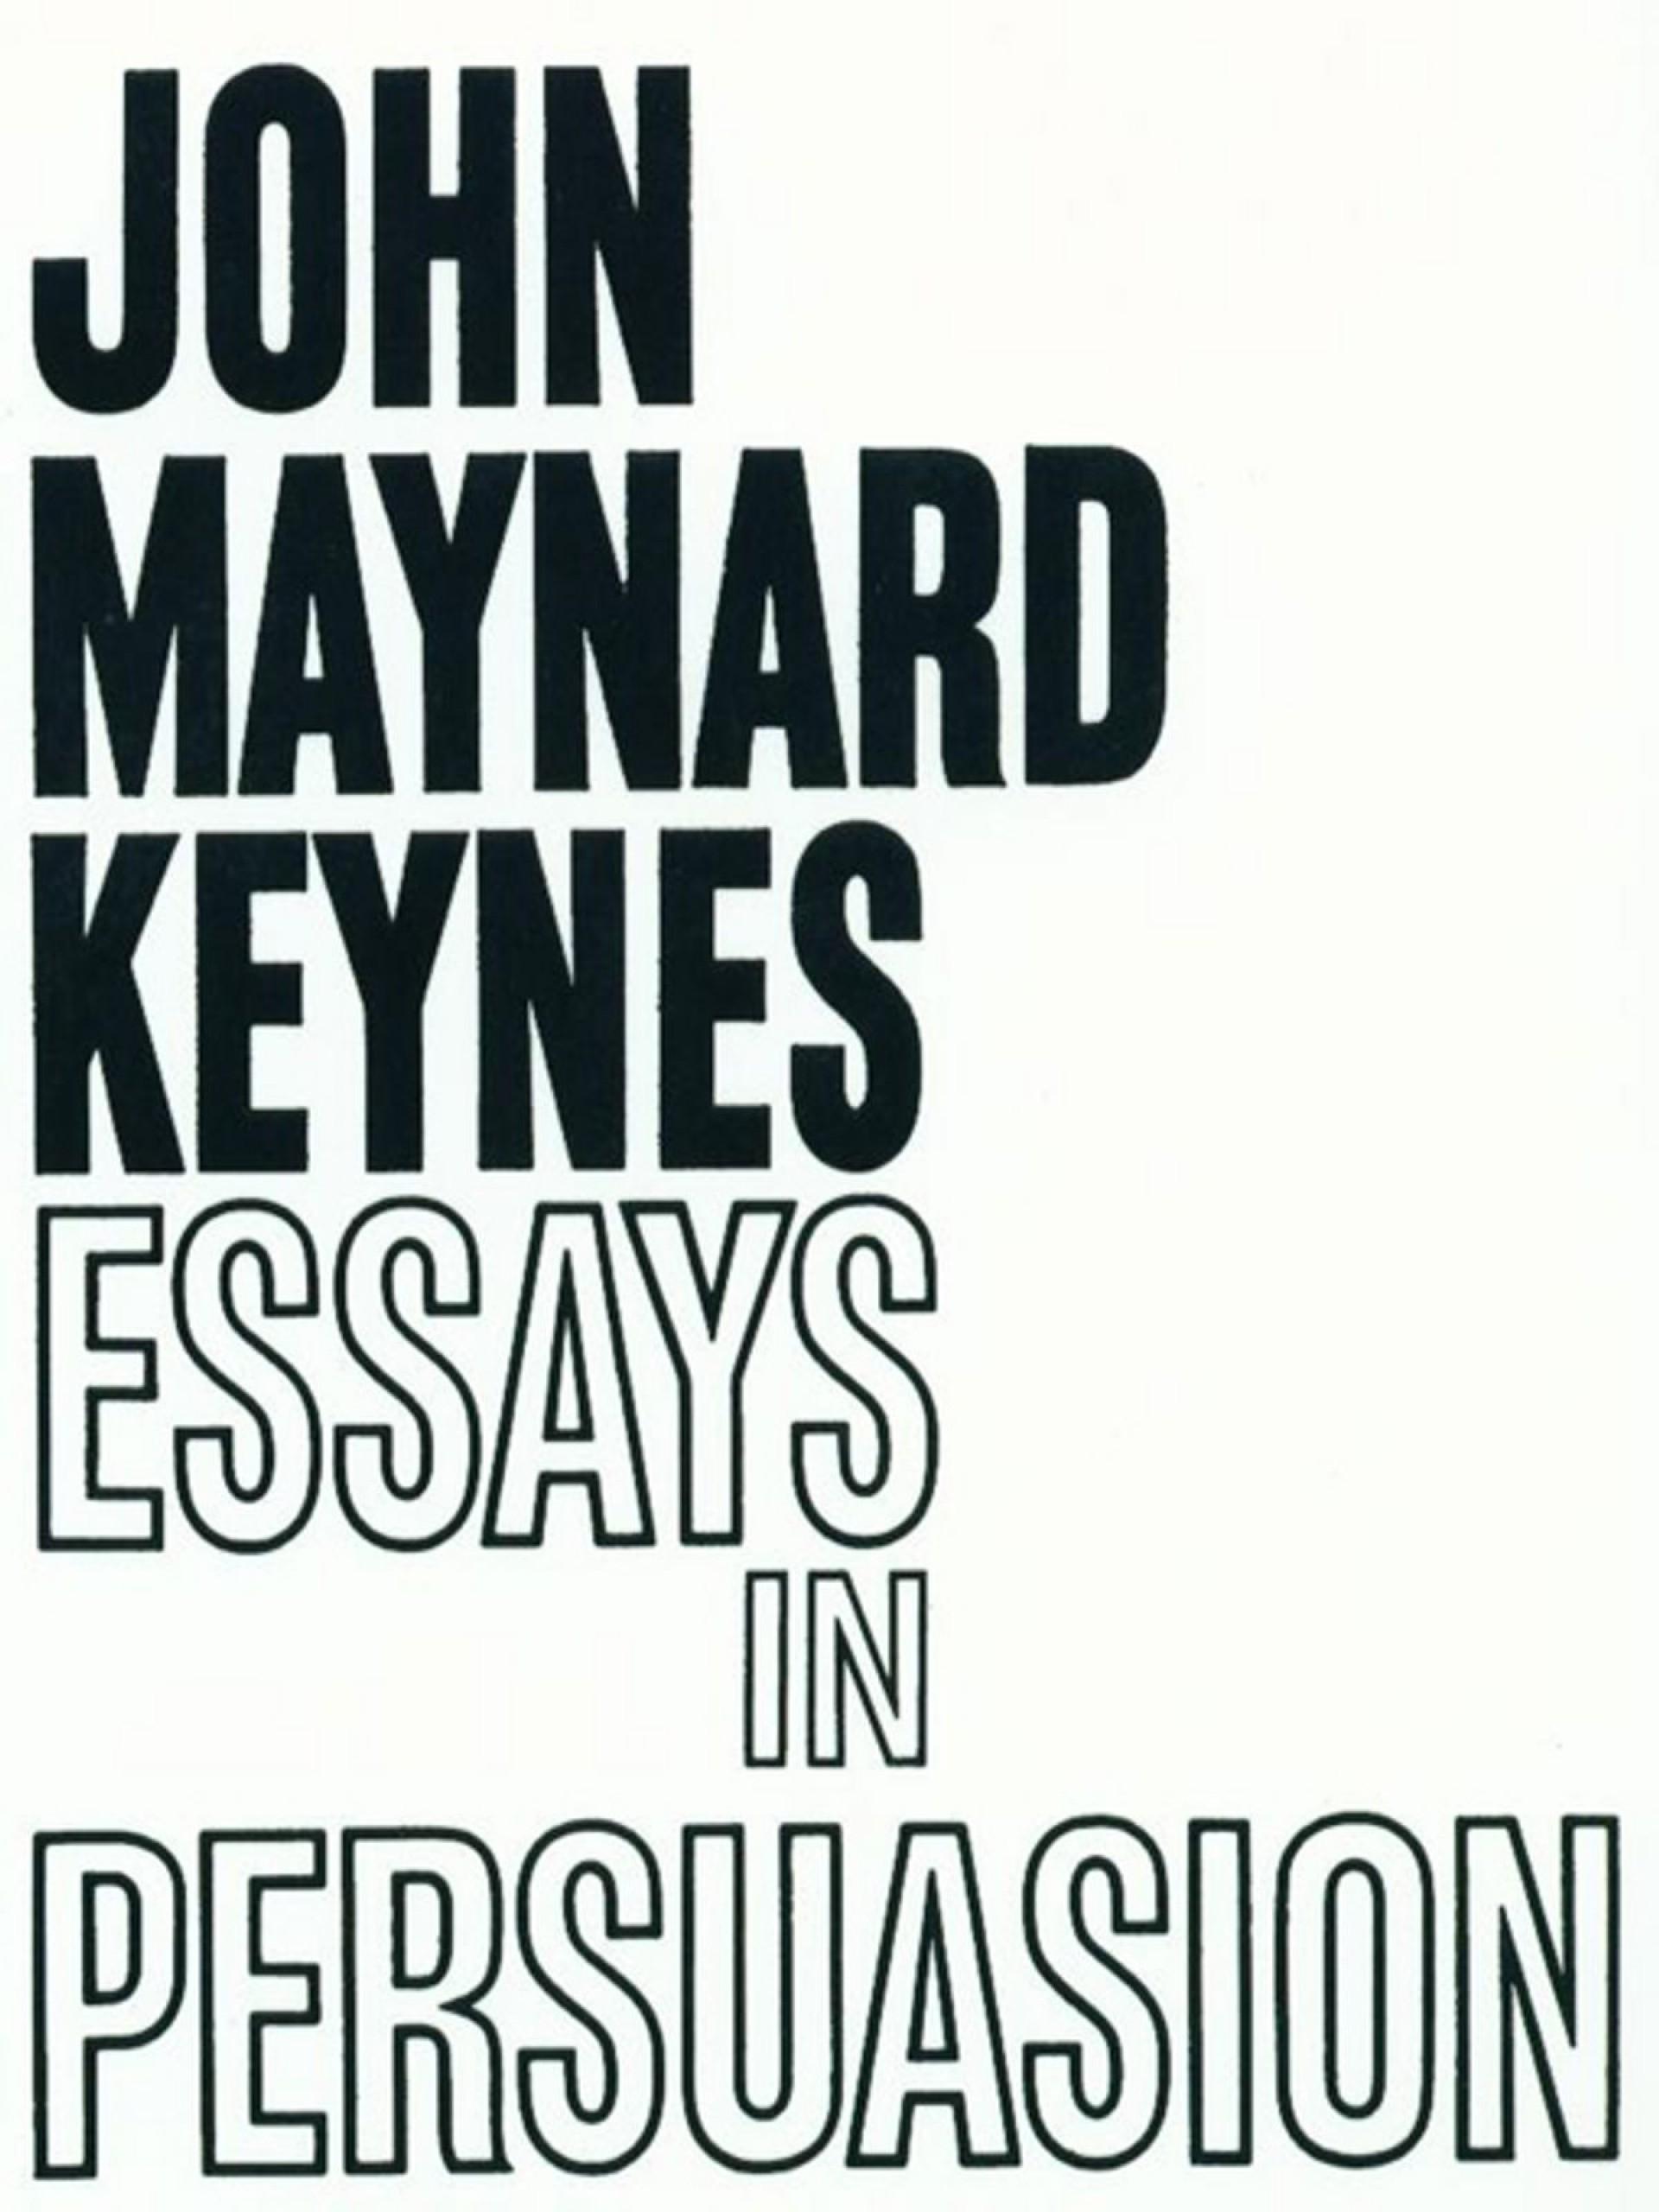 012 Essays In Persuasion Essay Remarkable Audiobook Pdf John Maynard Keynes Summary 1920